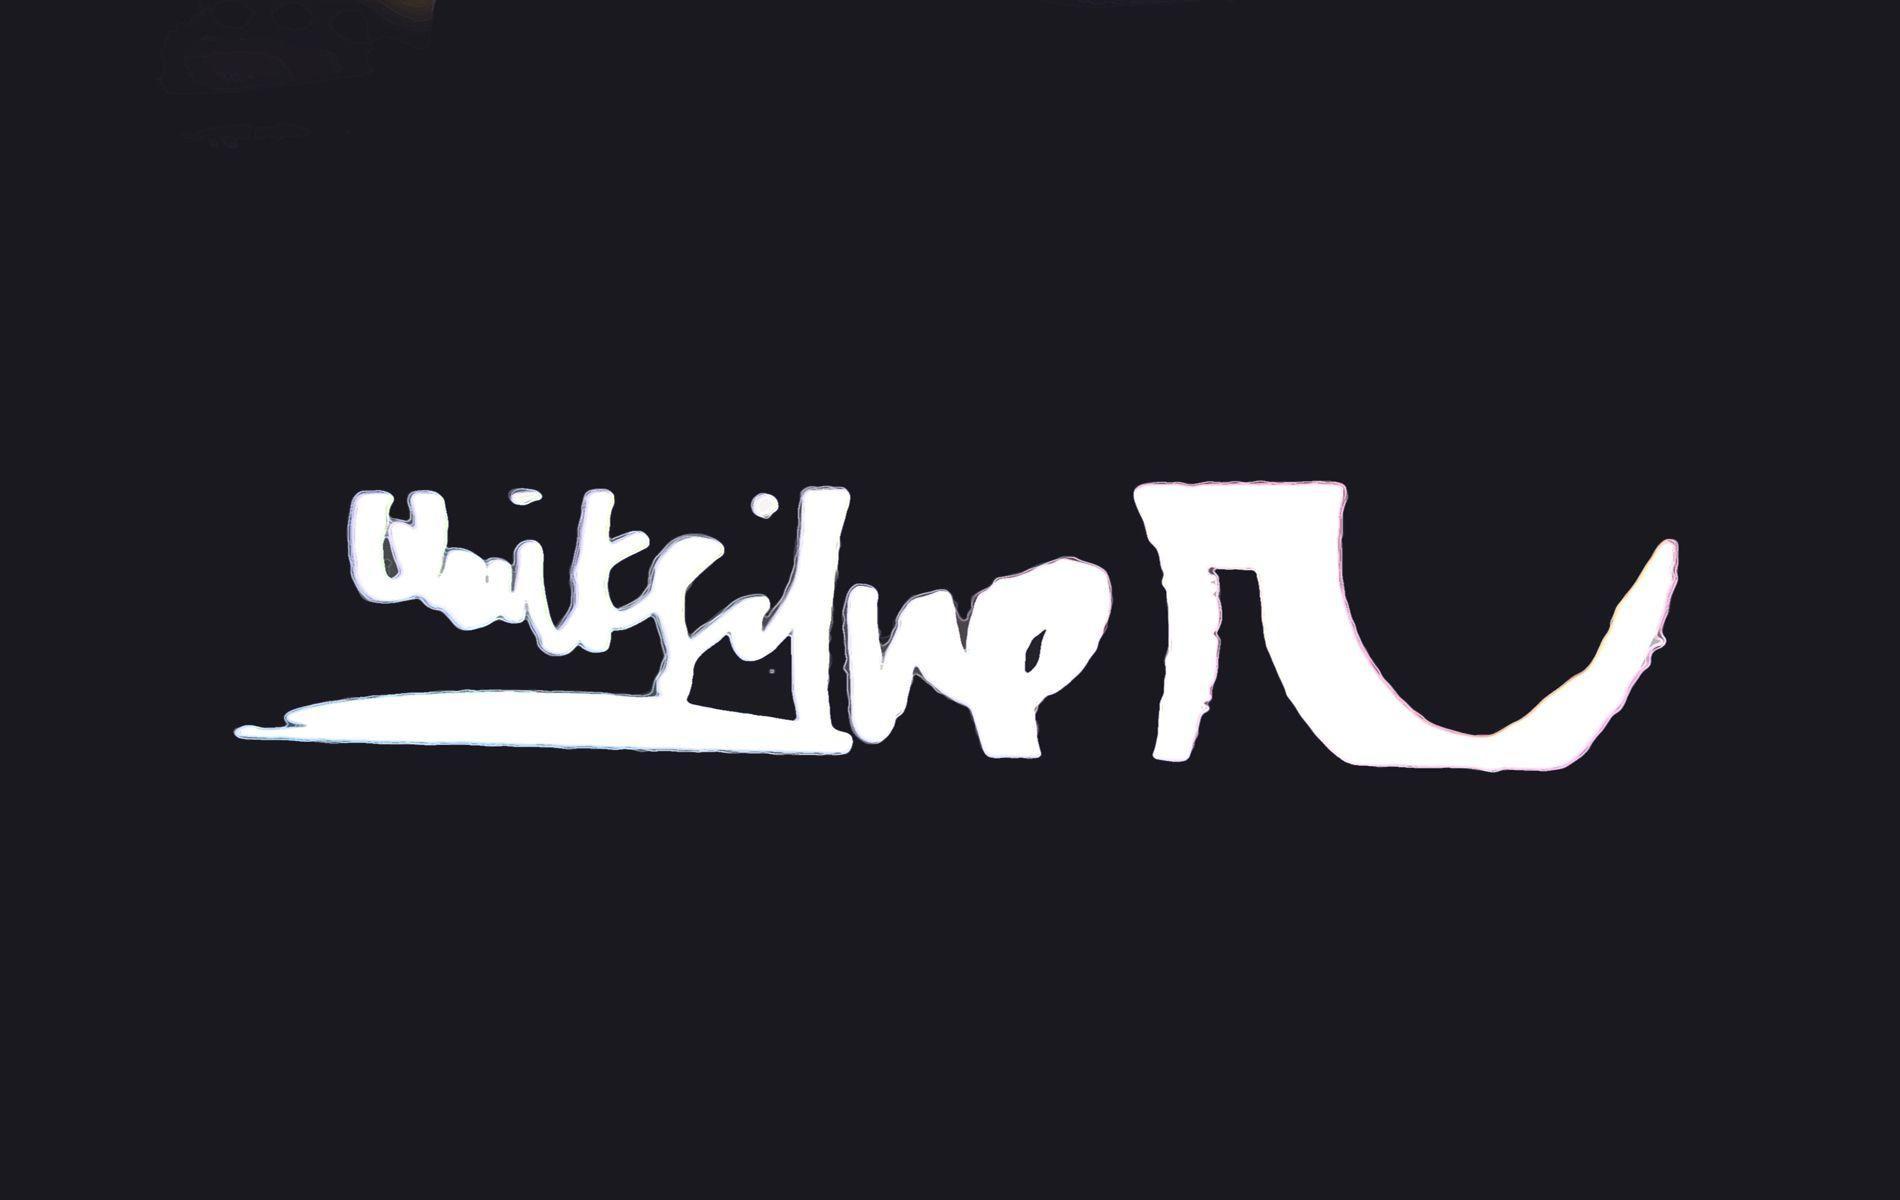 best design quiksilver logo wallpaper hd images widescreen wallumi